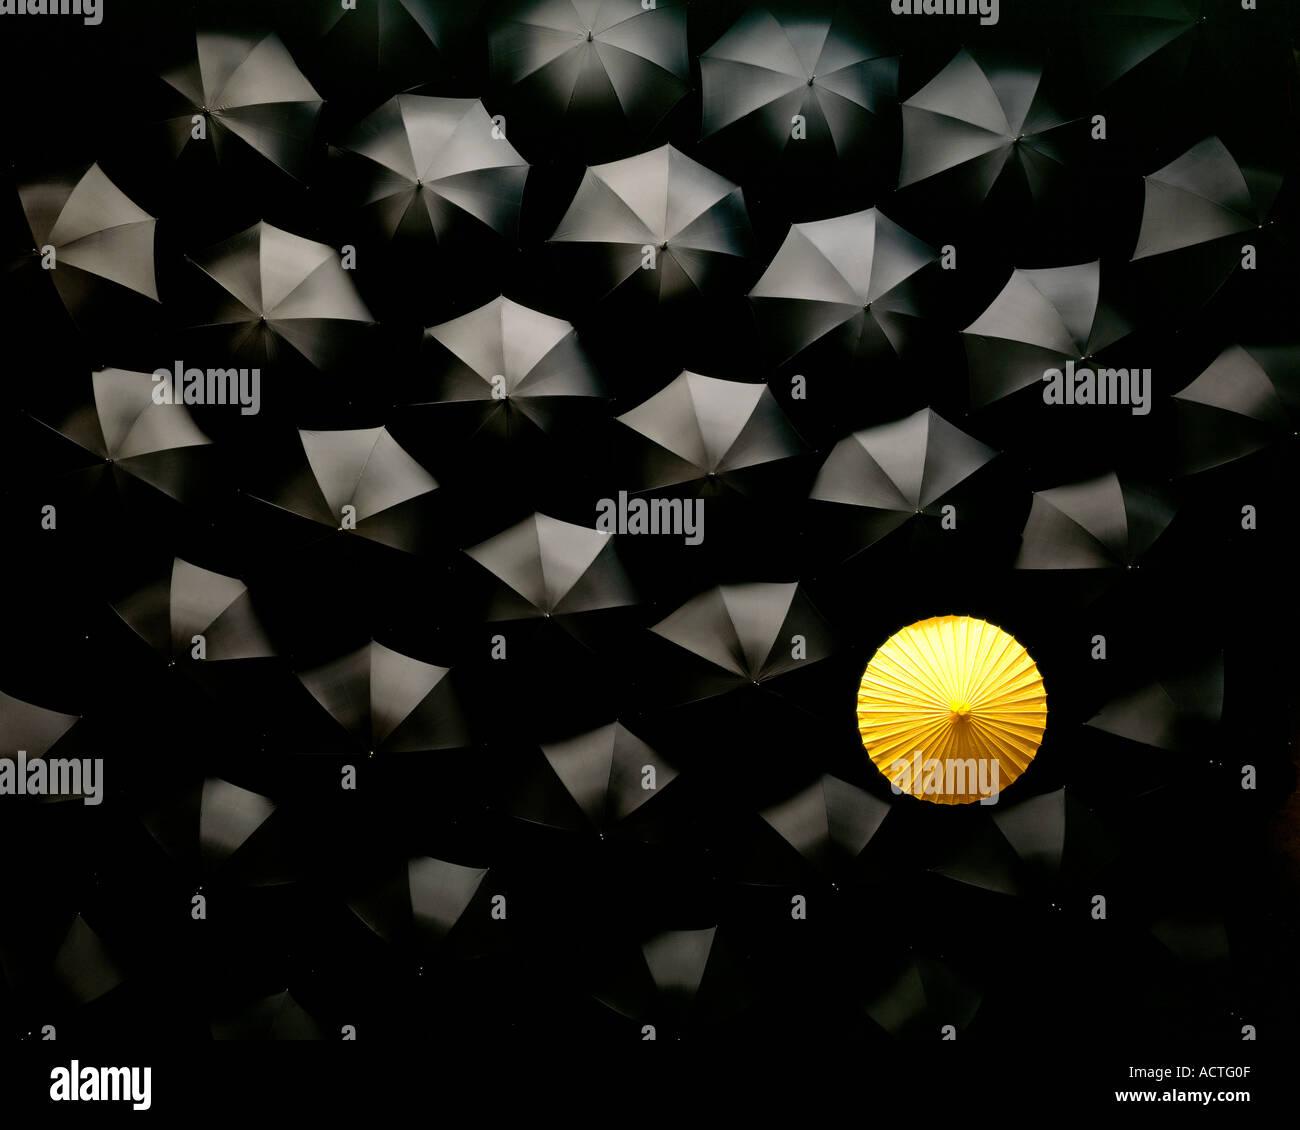 Muchos PARAGUAS paraguas negro y un paraguas amarillo japonés chino Asia Imagen De Stock